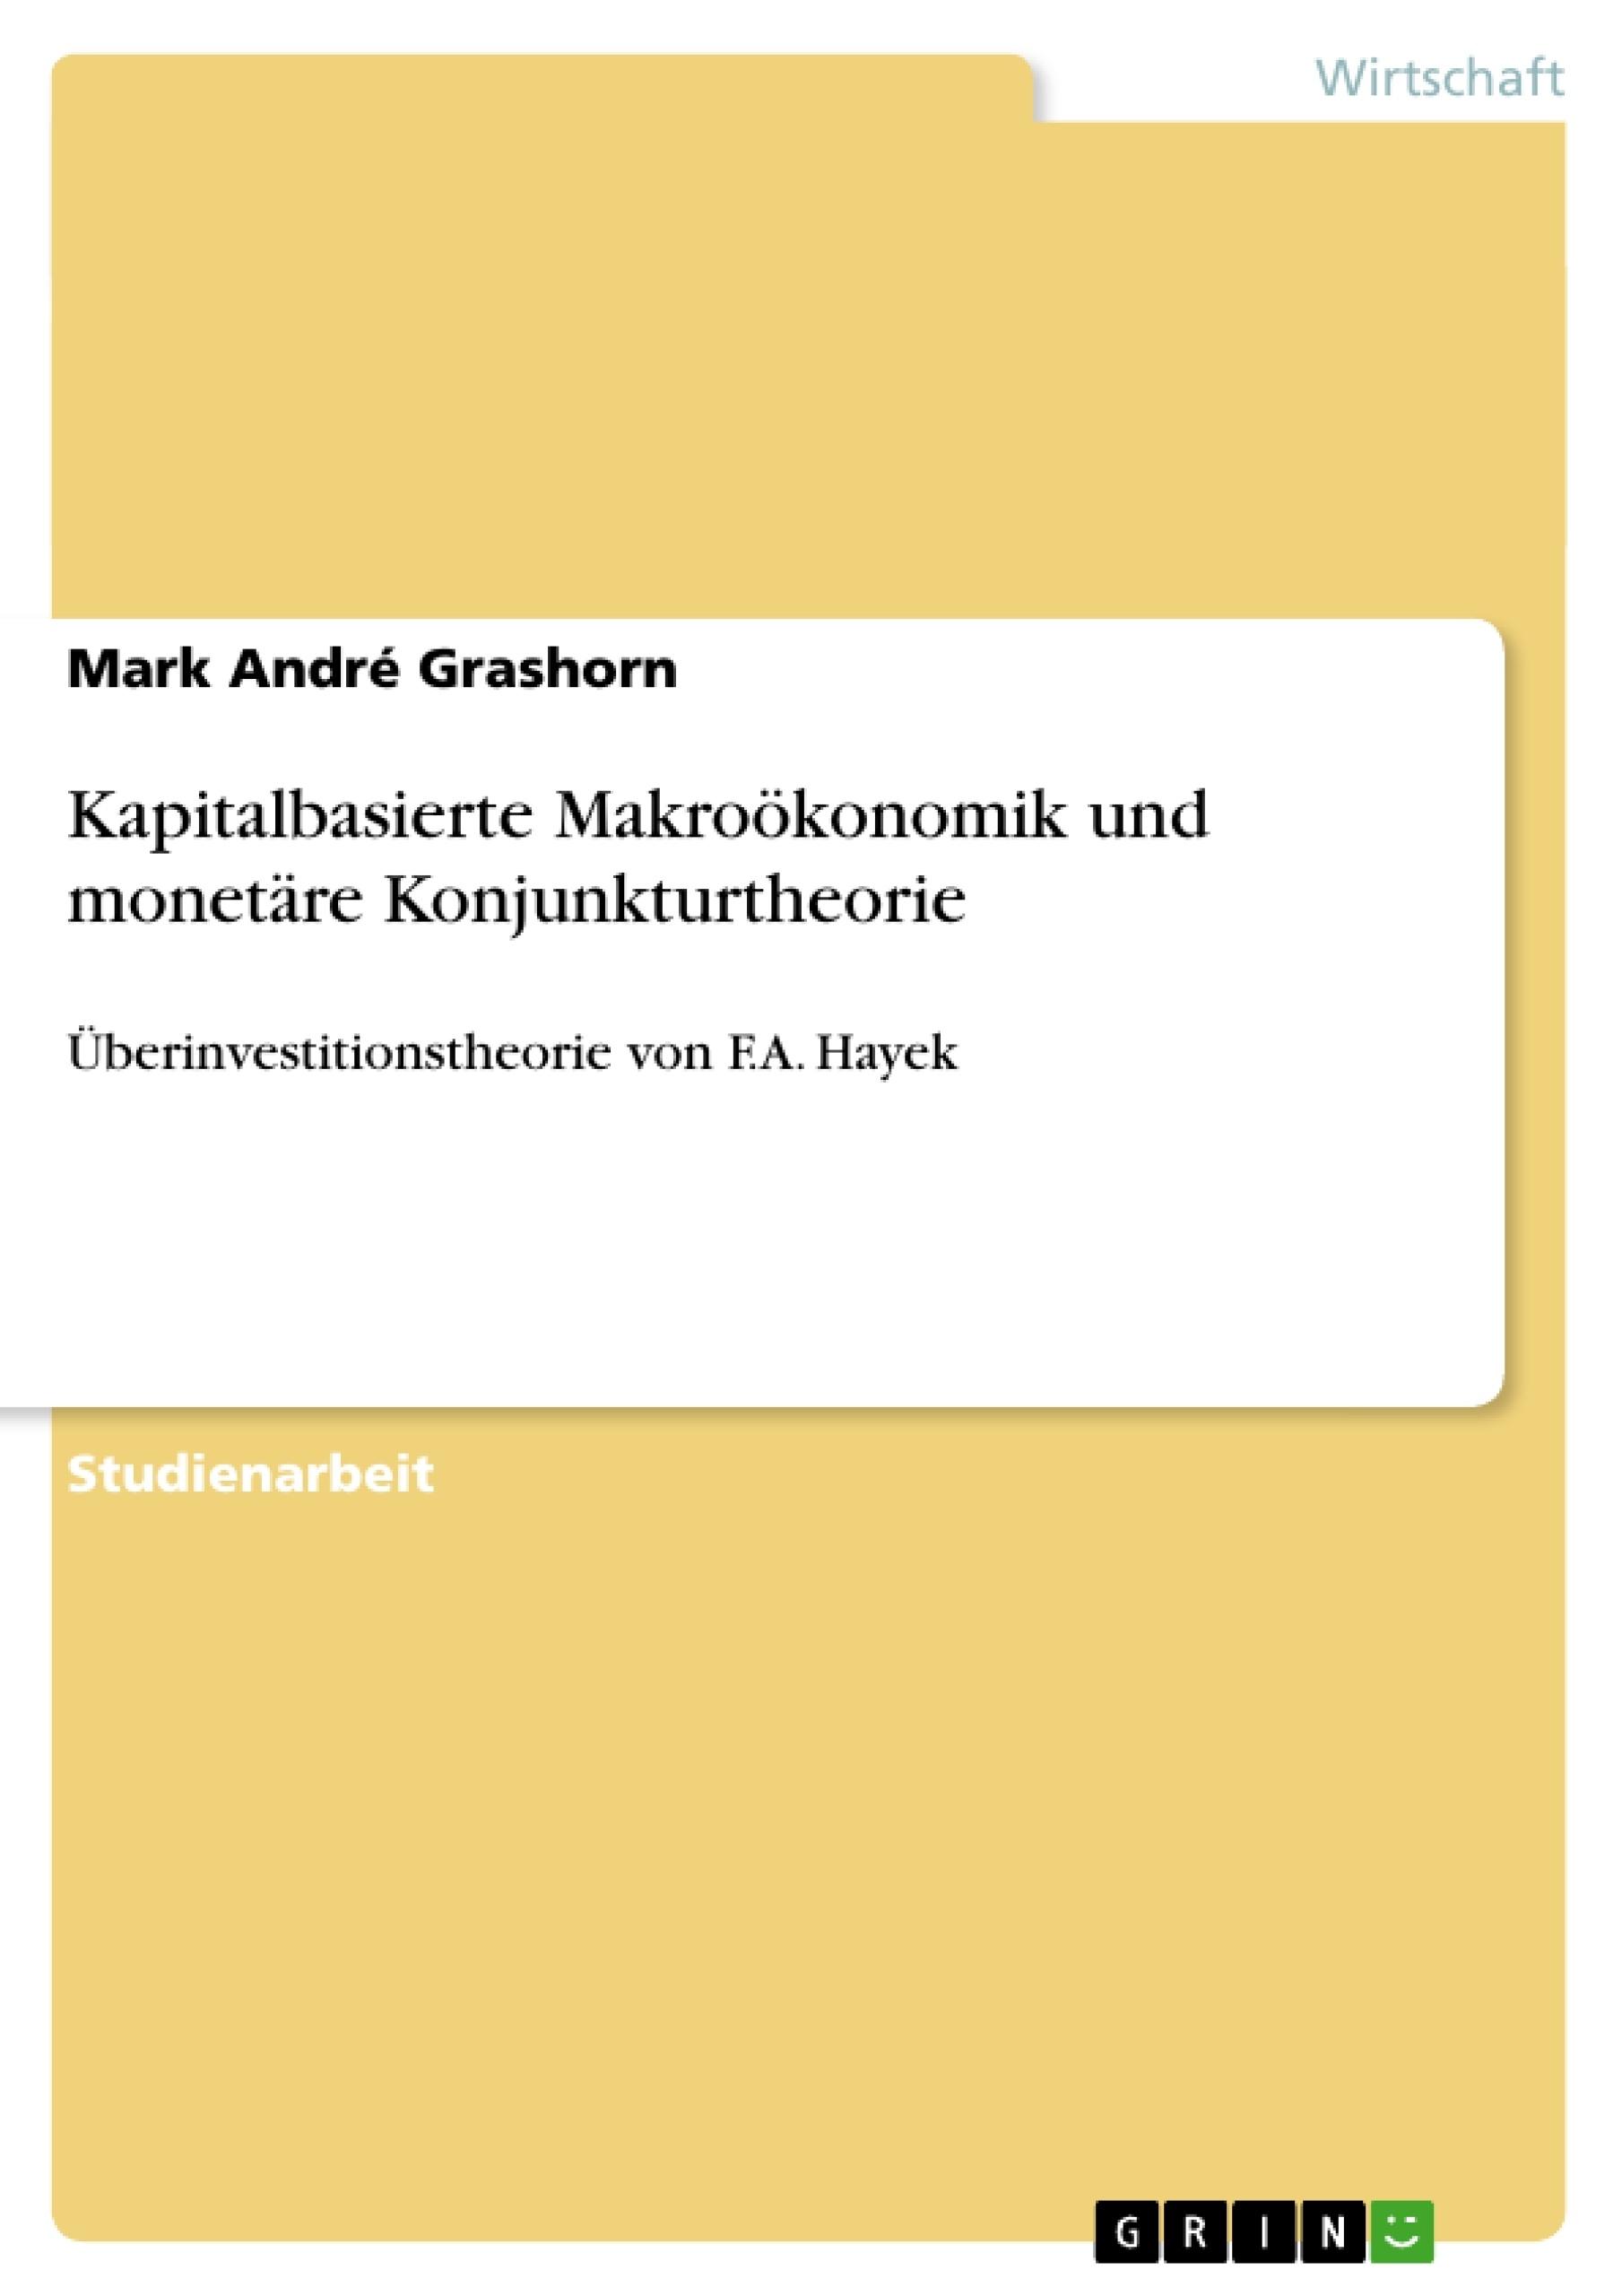 Titel: Kapitalbasierte Makroökonomik und monetäre Konjunkturtheorie